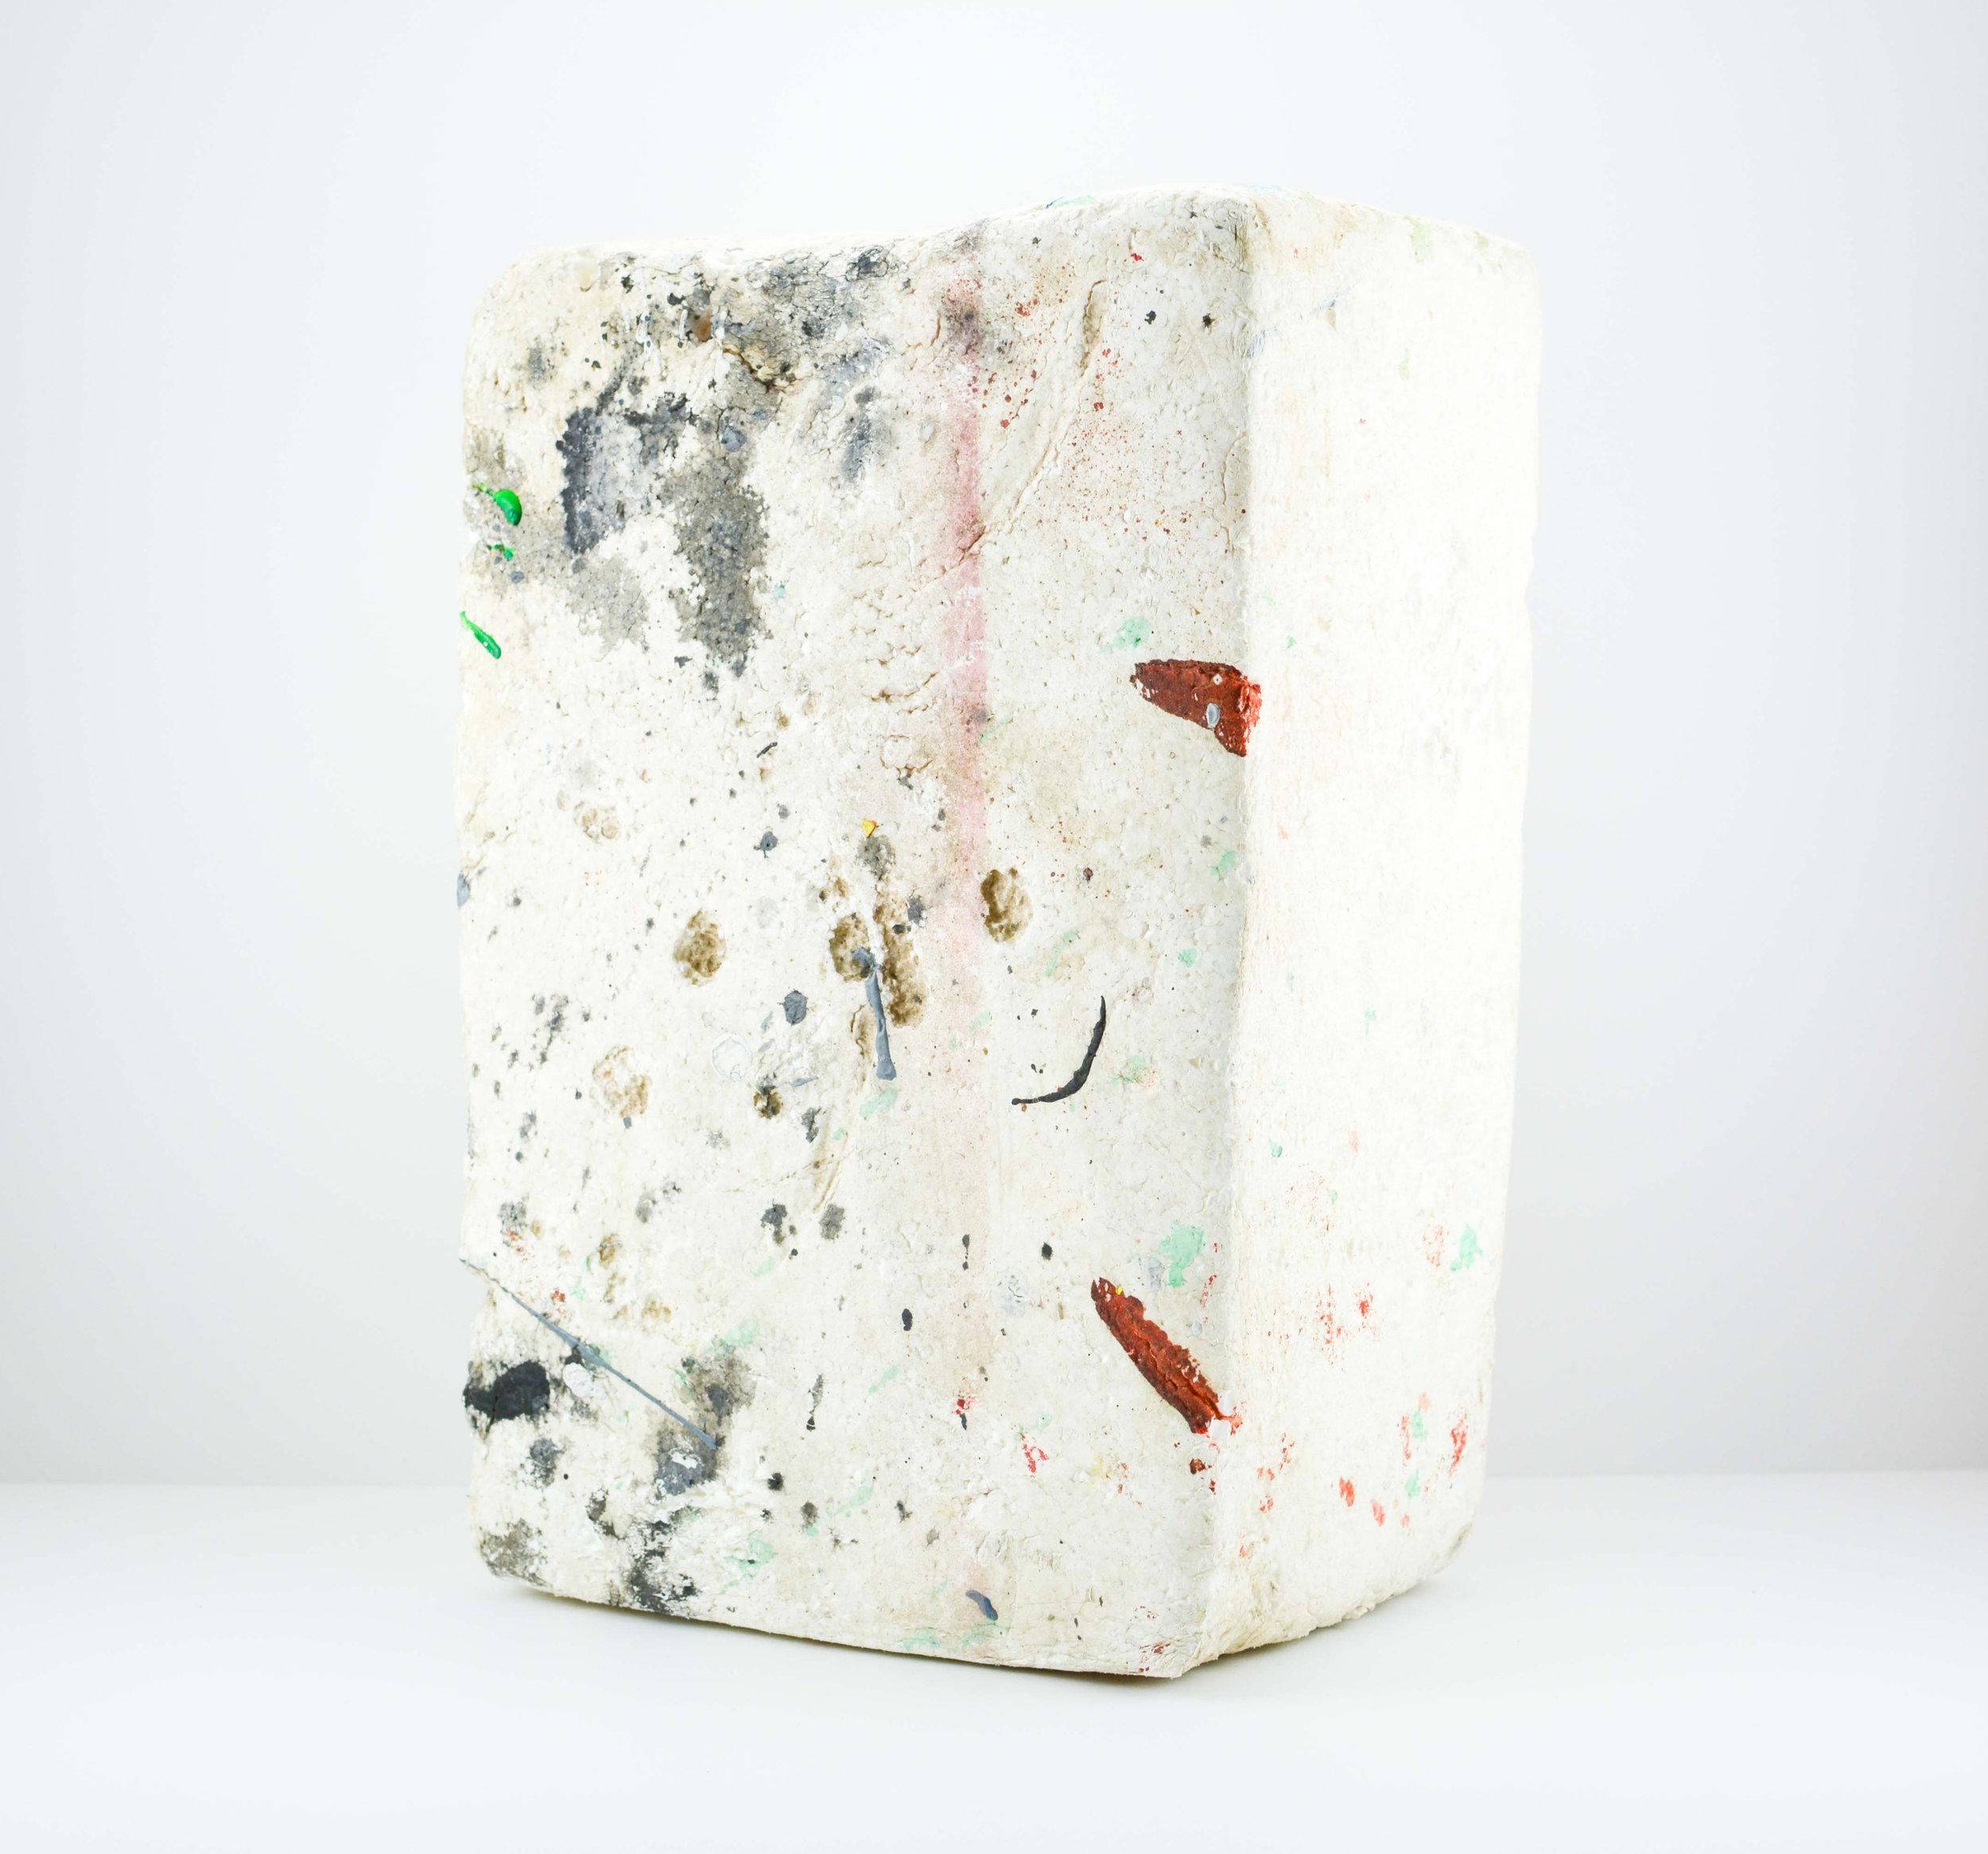 Paul Simmons,  Weathered Styrofoam